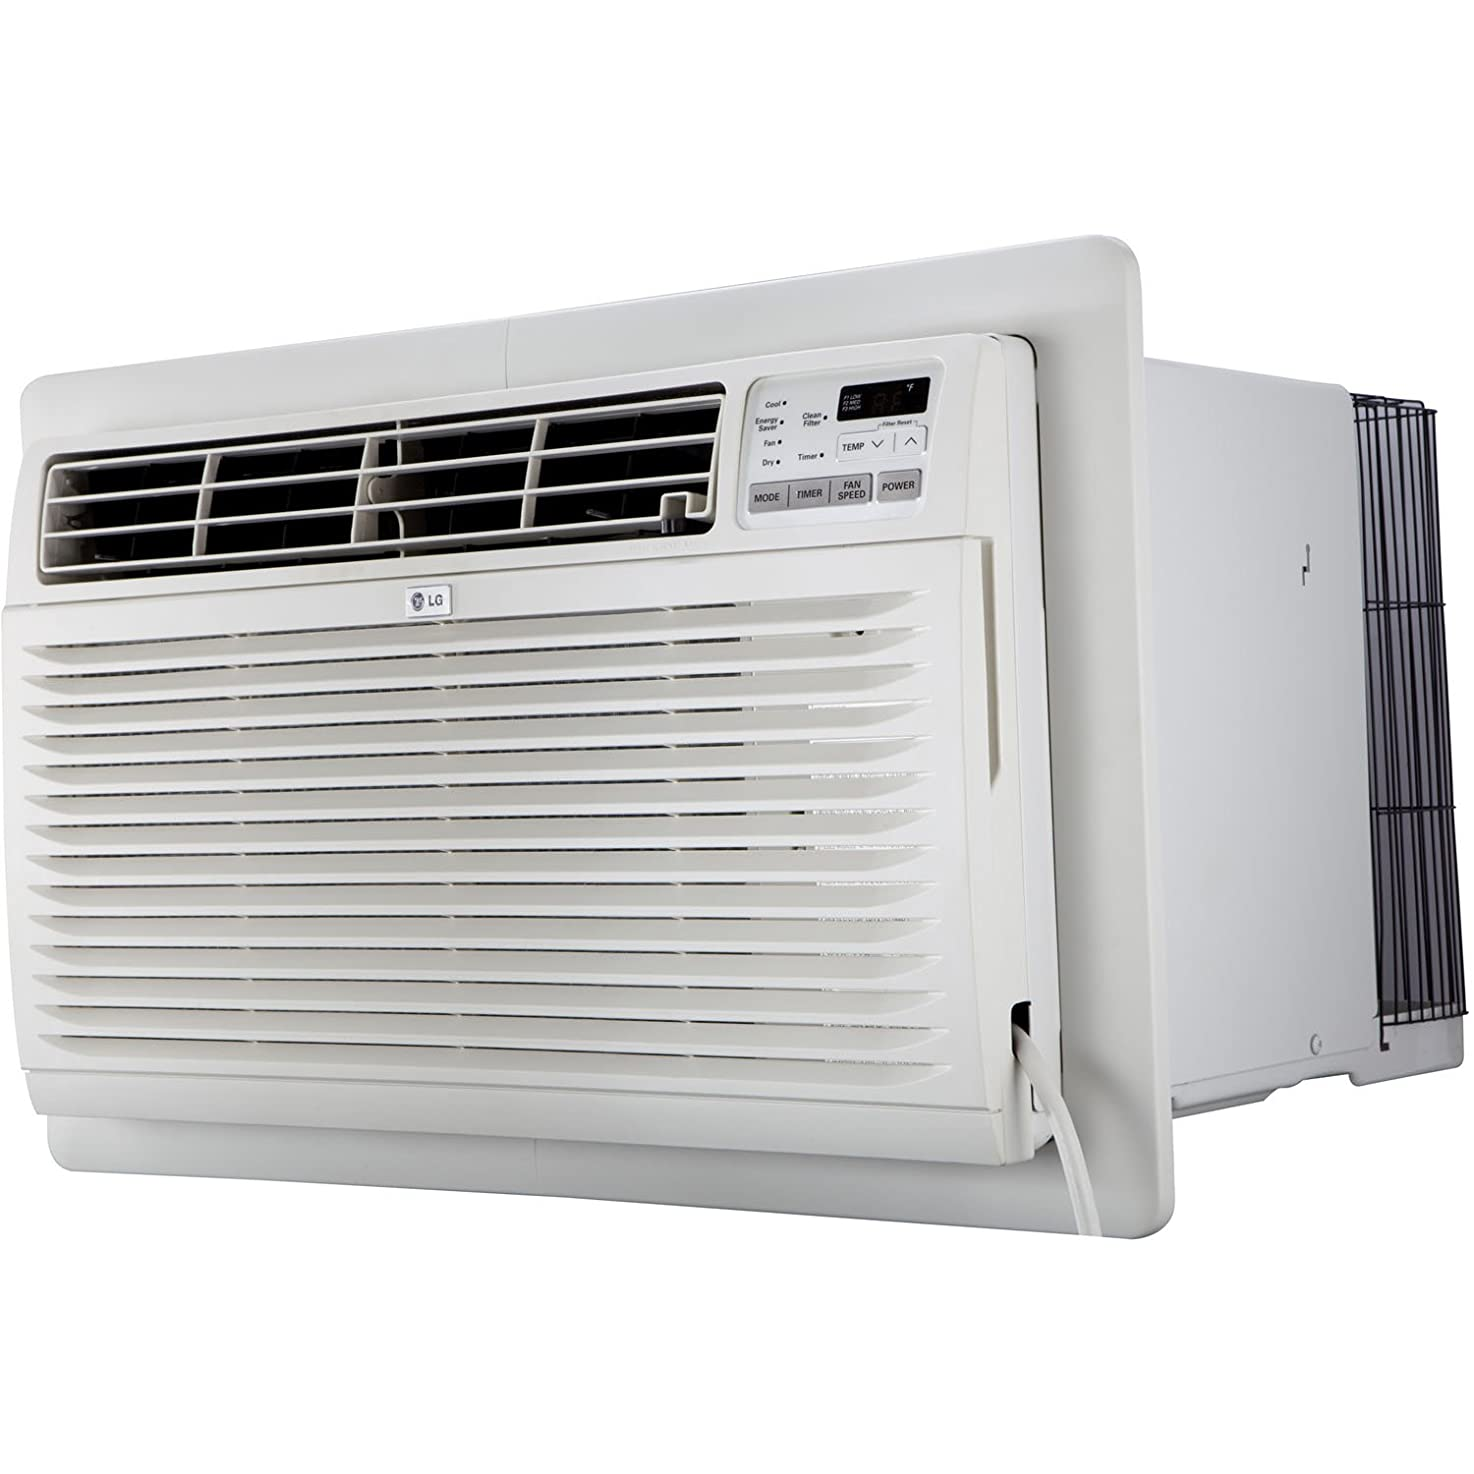 LG LT1236CER 11,500 BTU 230V Through-The-Wall Remote Control Air Conditioner, White ljtyhhcniipkd0